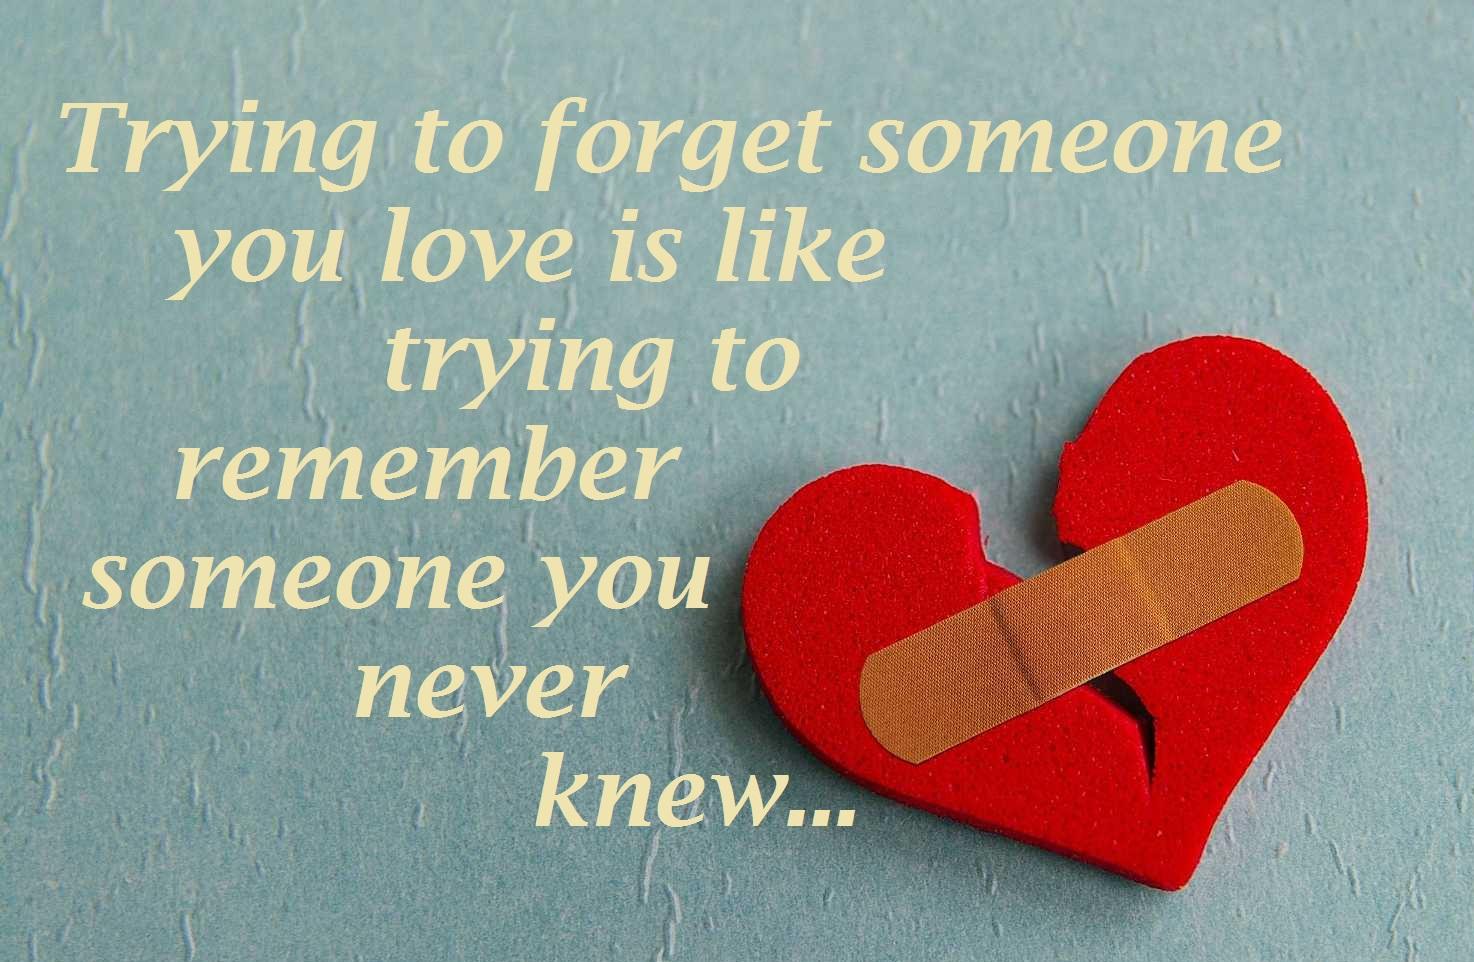 Top Broken Heart Quotes 2017 Images Free Download